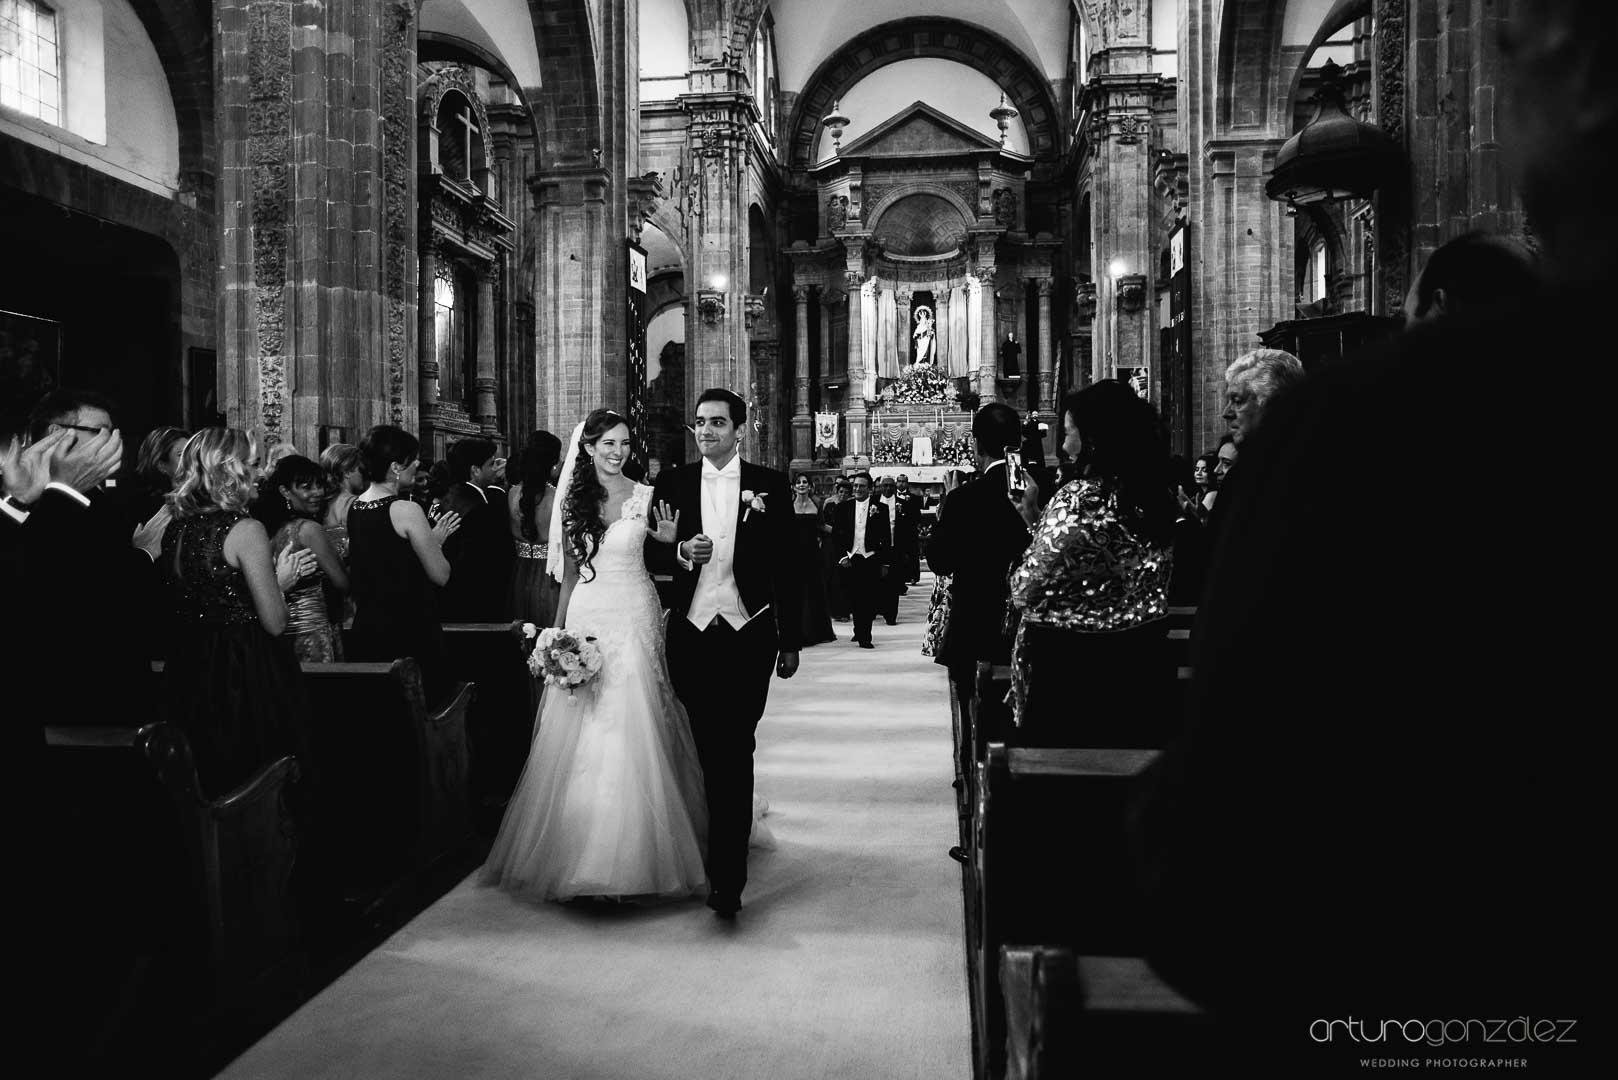 fotografo-de-bodas-en-guanajuato-78